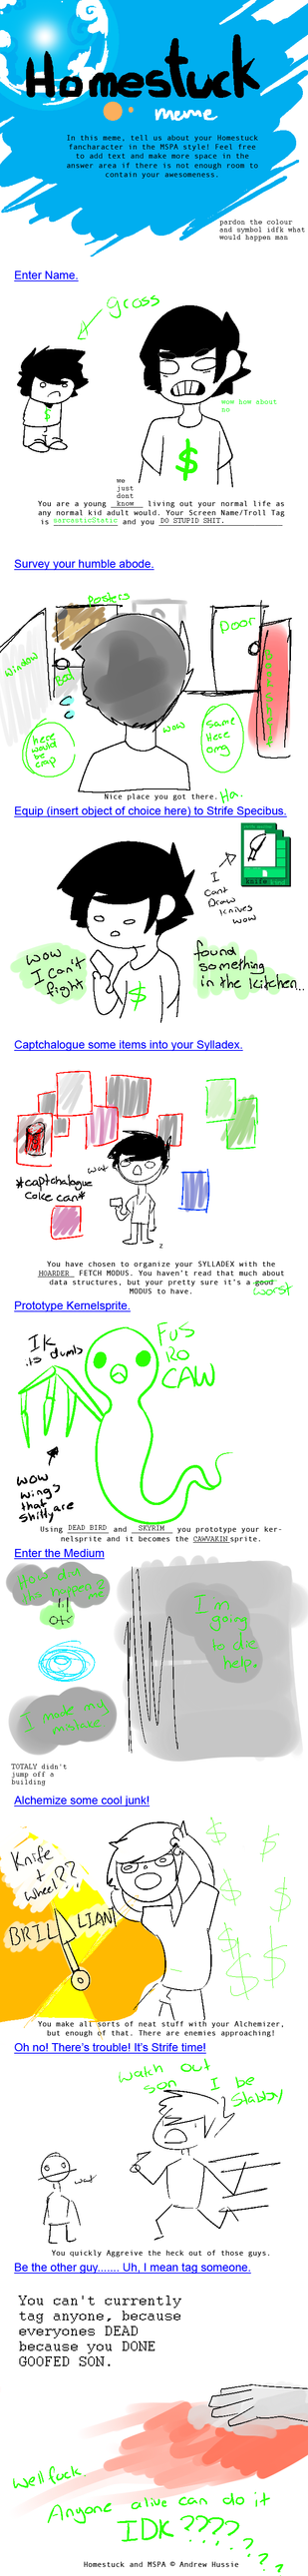 Homestuck Meme by 5wa1n